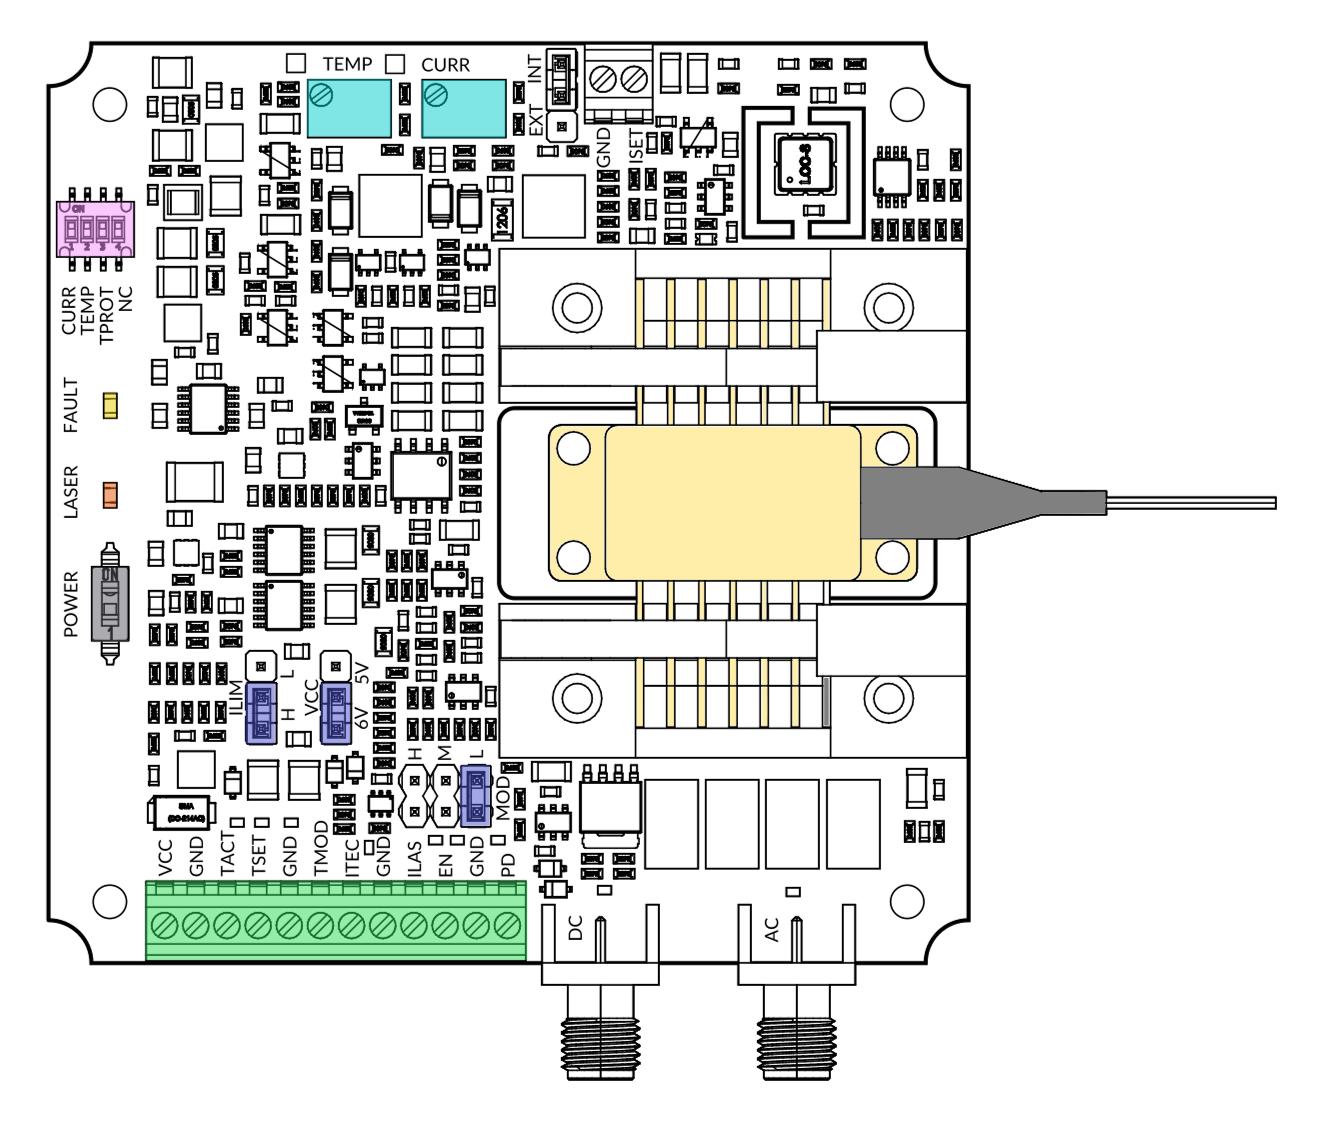 CTL101 user interface